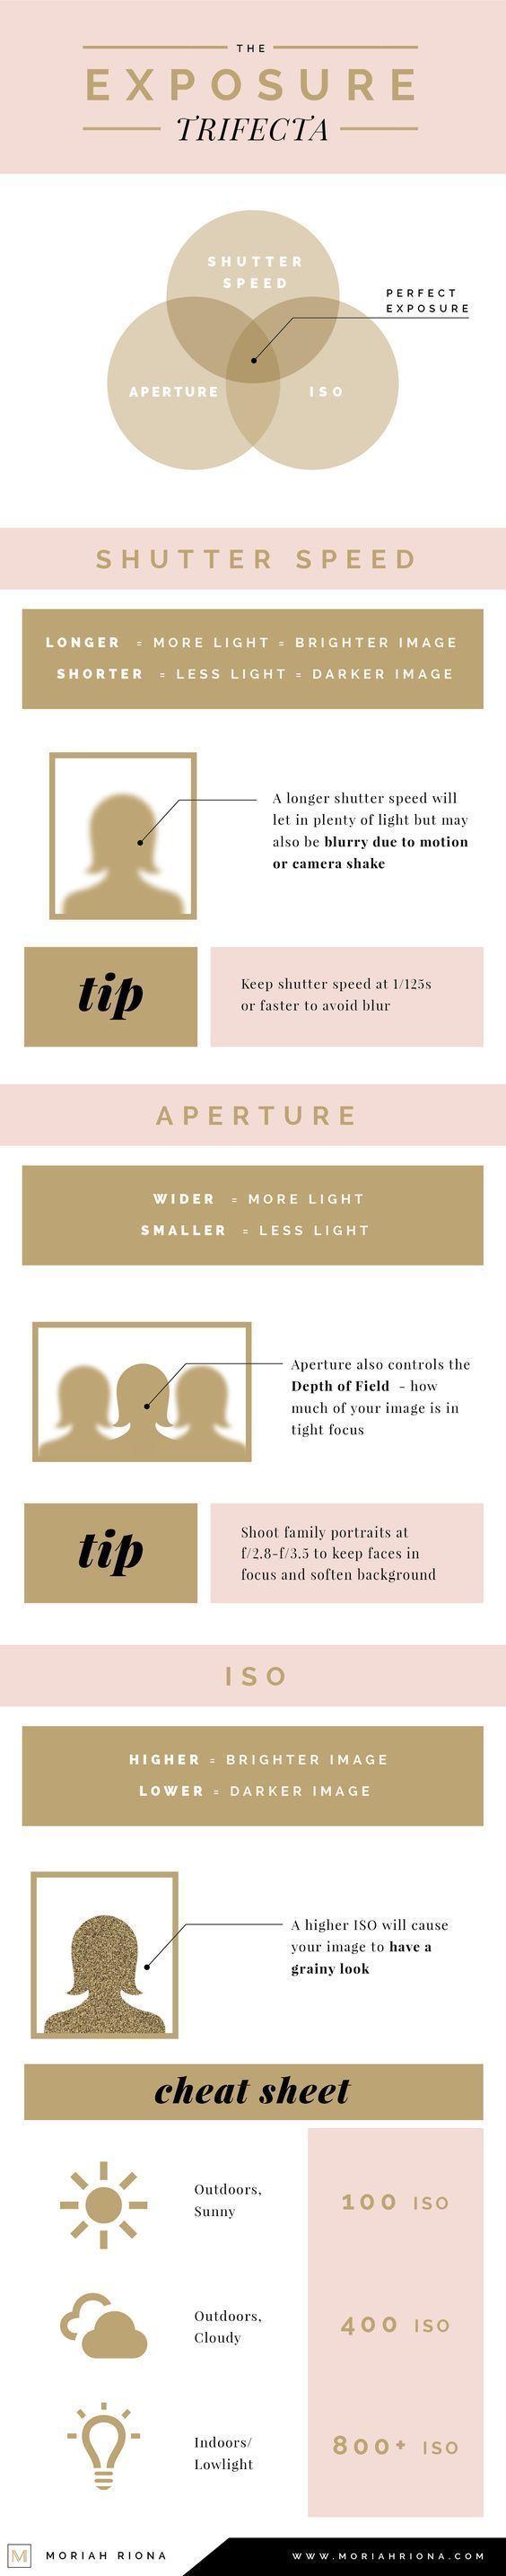 Manual Mode: The Ultimate Guide for Beginner Photographers - #beginner #For #Guide #Manual #mode #Photographers #The #Ultimate